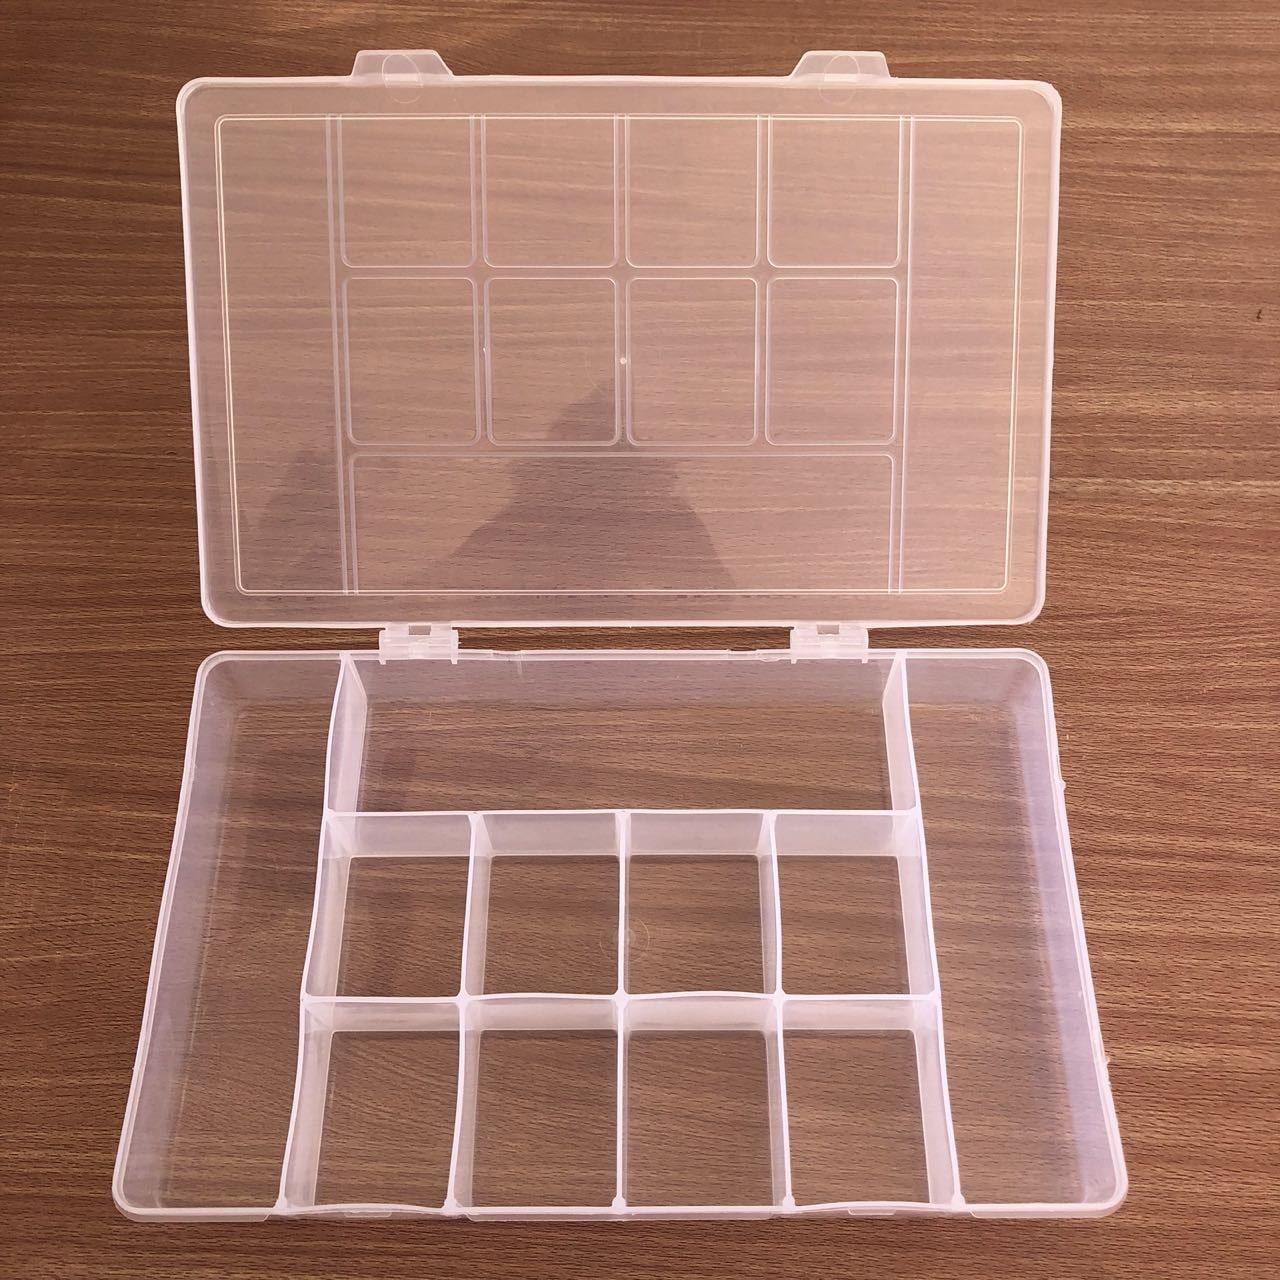 BD03 - Box Organizador G - 01 Unid